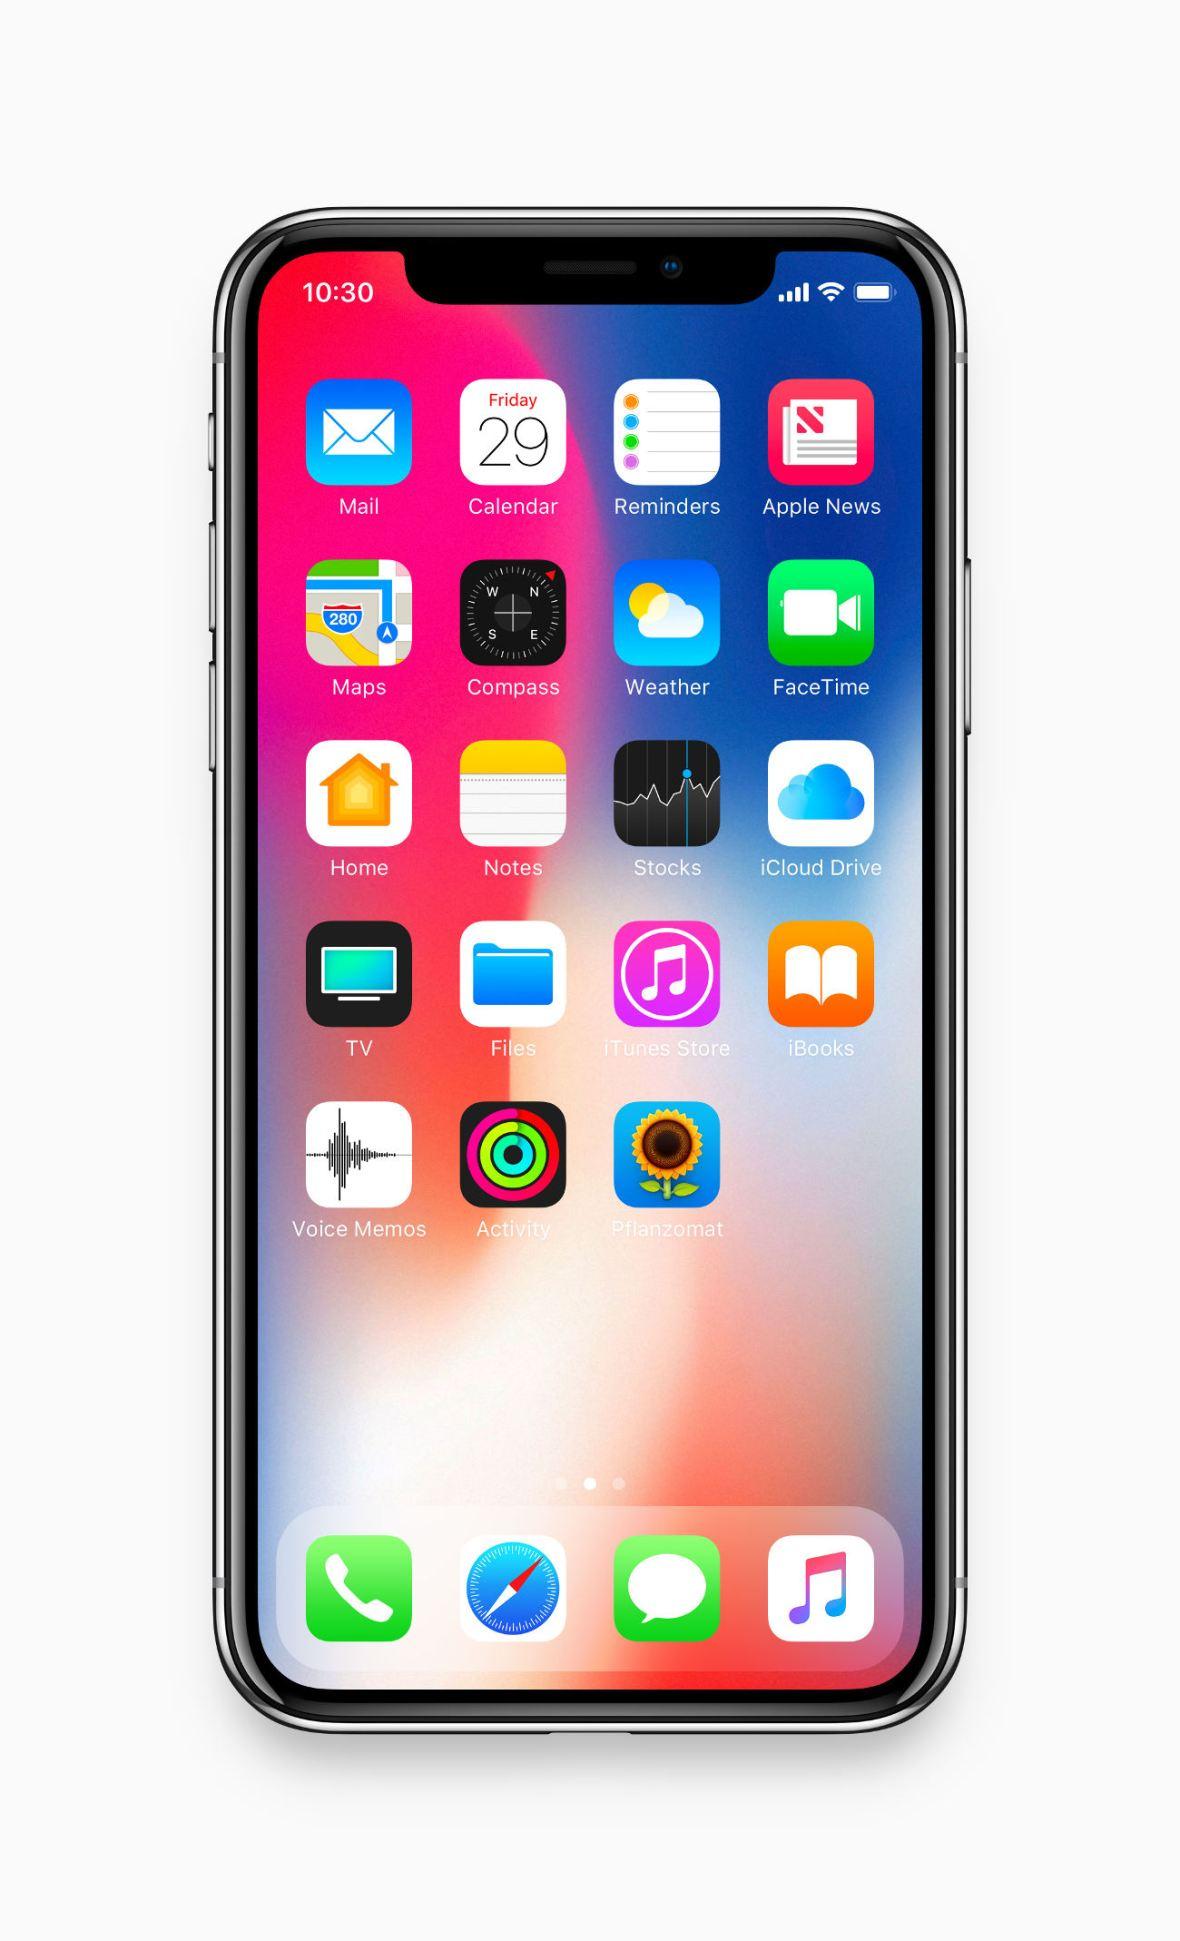 iPhone X Mockup (fit 2436 x 1125 pixel resolution)